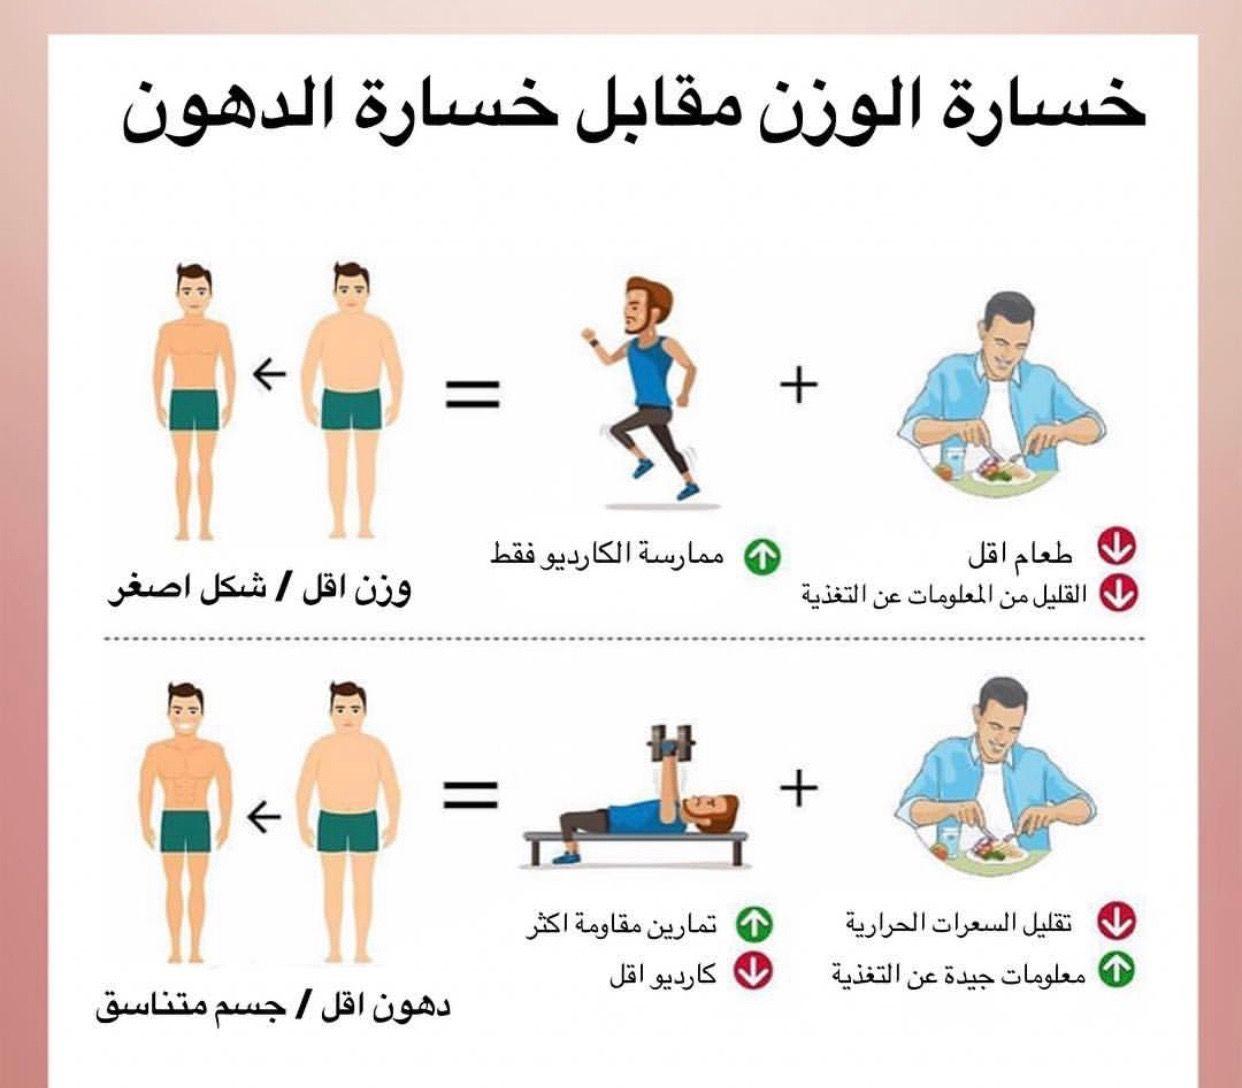 Pin By ر بى العتايقه On اشياء طبية Exercise Instagram Posts Instagram